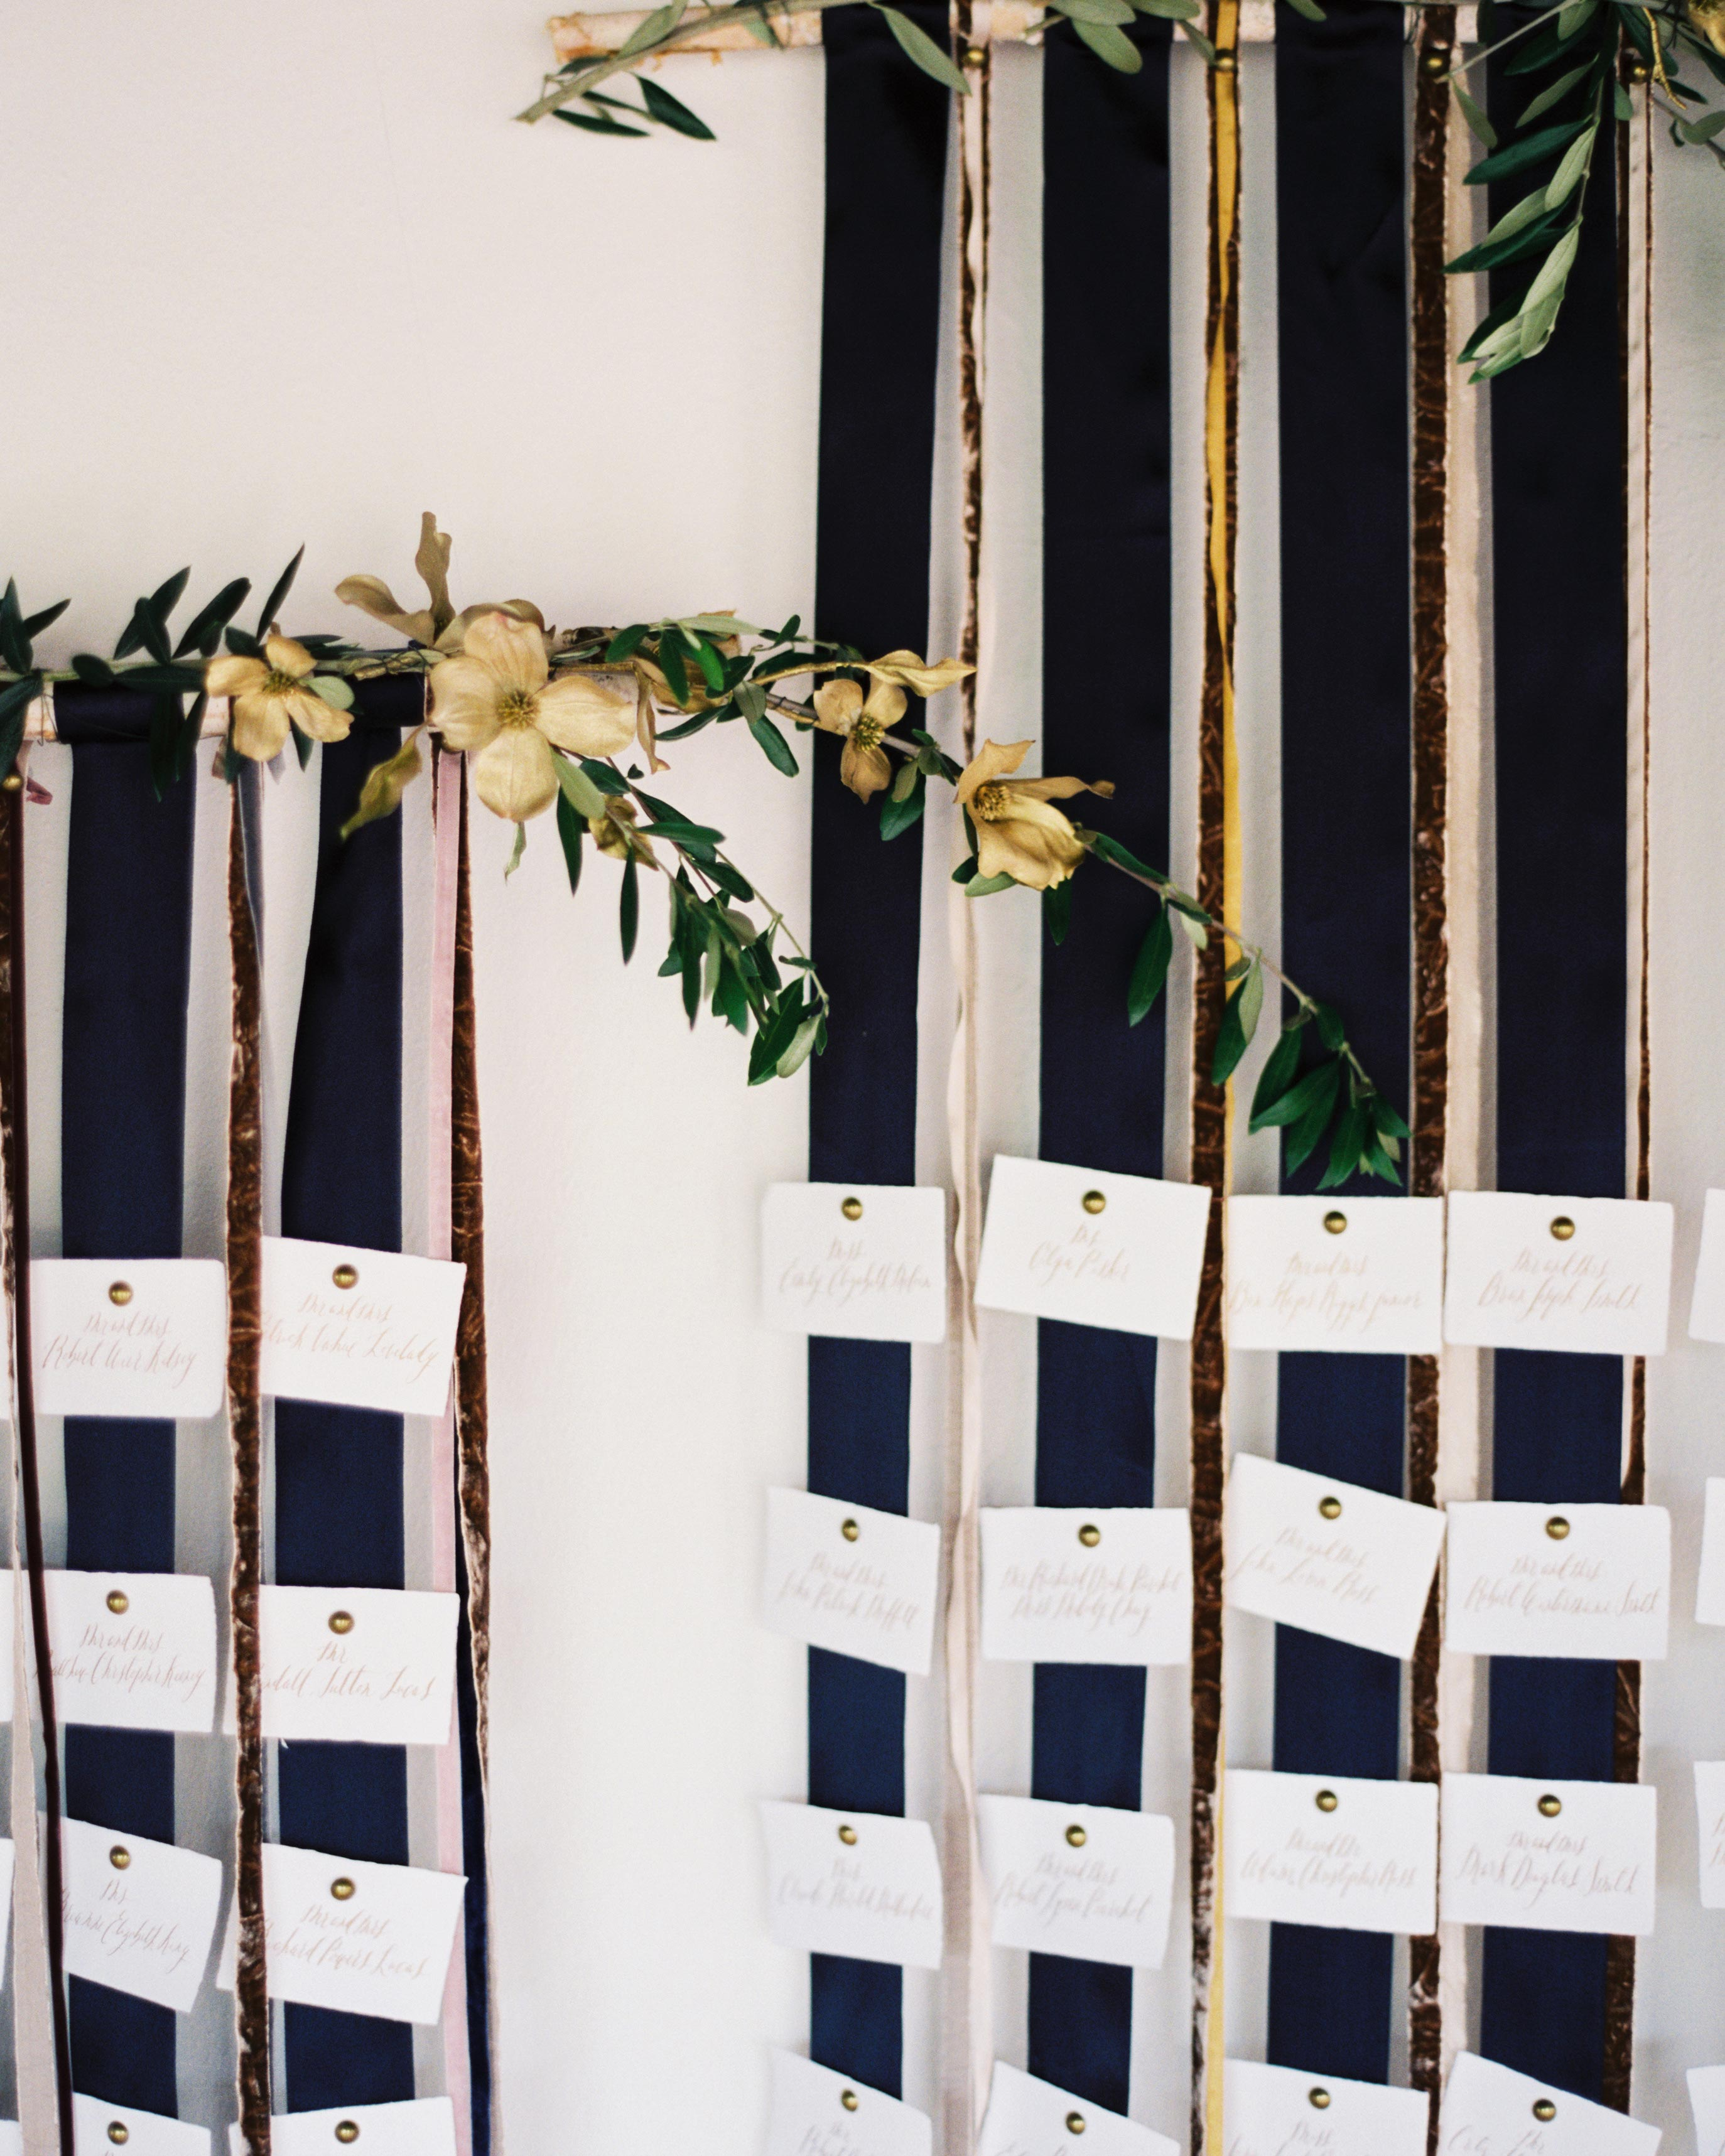 ginny-andrew-wedding-escortcards-0228-s112676-0216.jpg